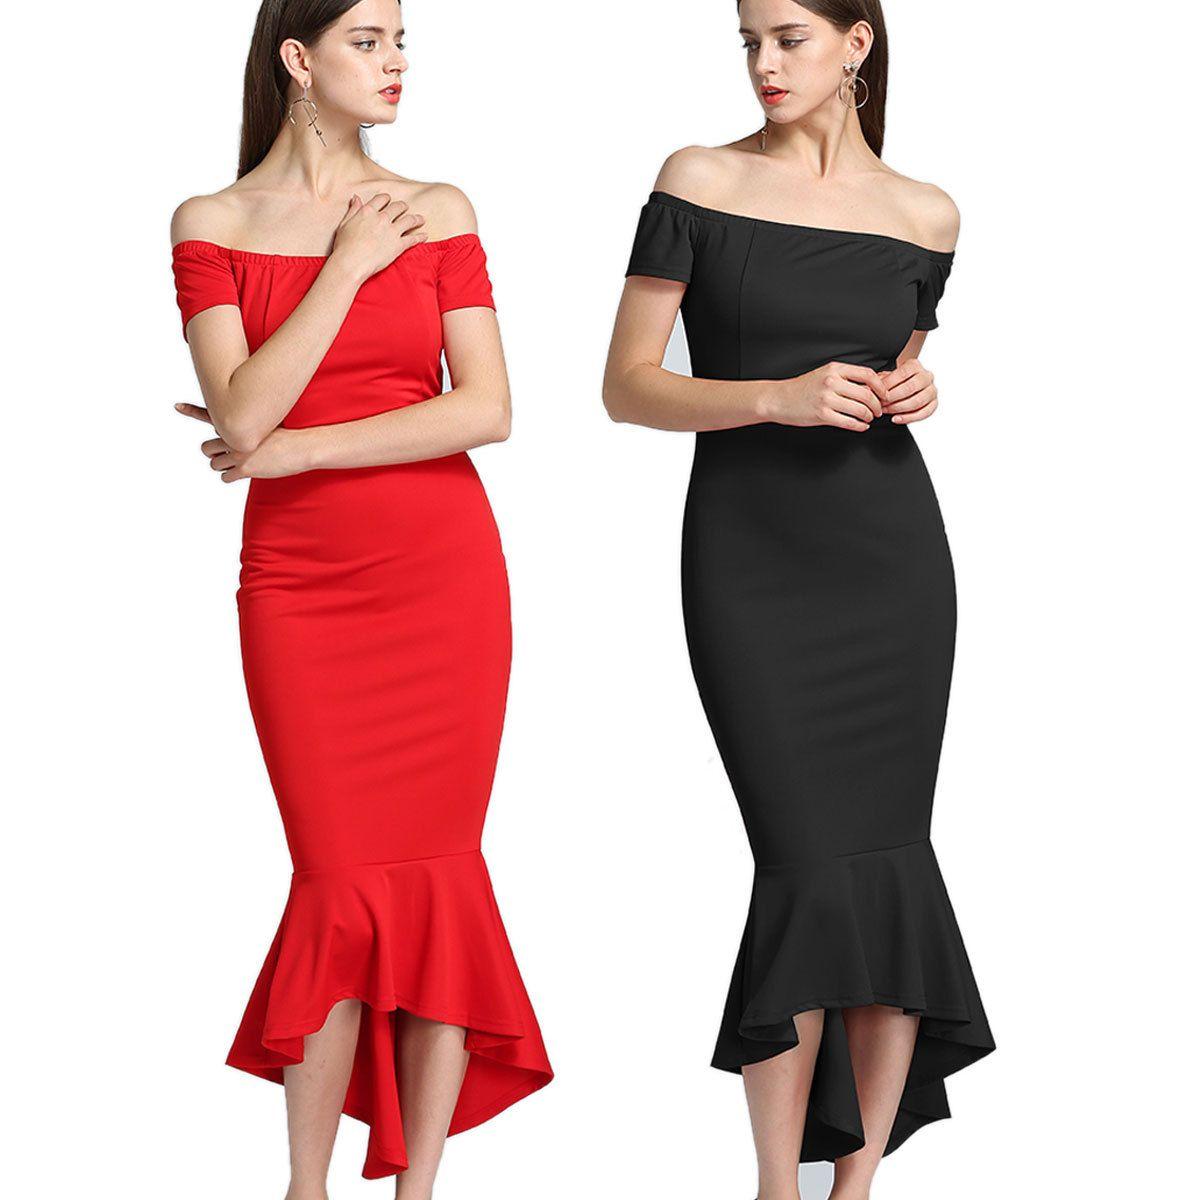 2019 Women Sexy Off Shoulder Party Dresses Lady Slash Neck Short Sleeve  Ruffled Hem Slim Evening Midi Mermaid Dress From Hengytrade eff748ece8e0